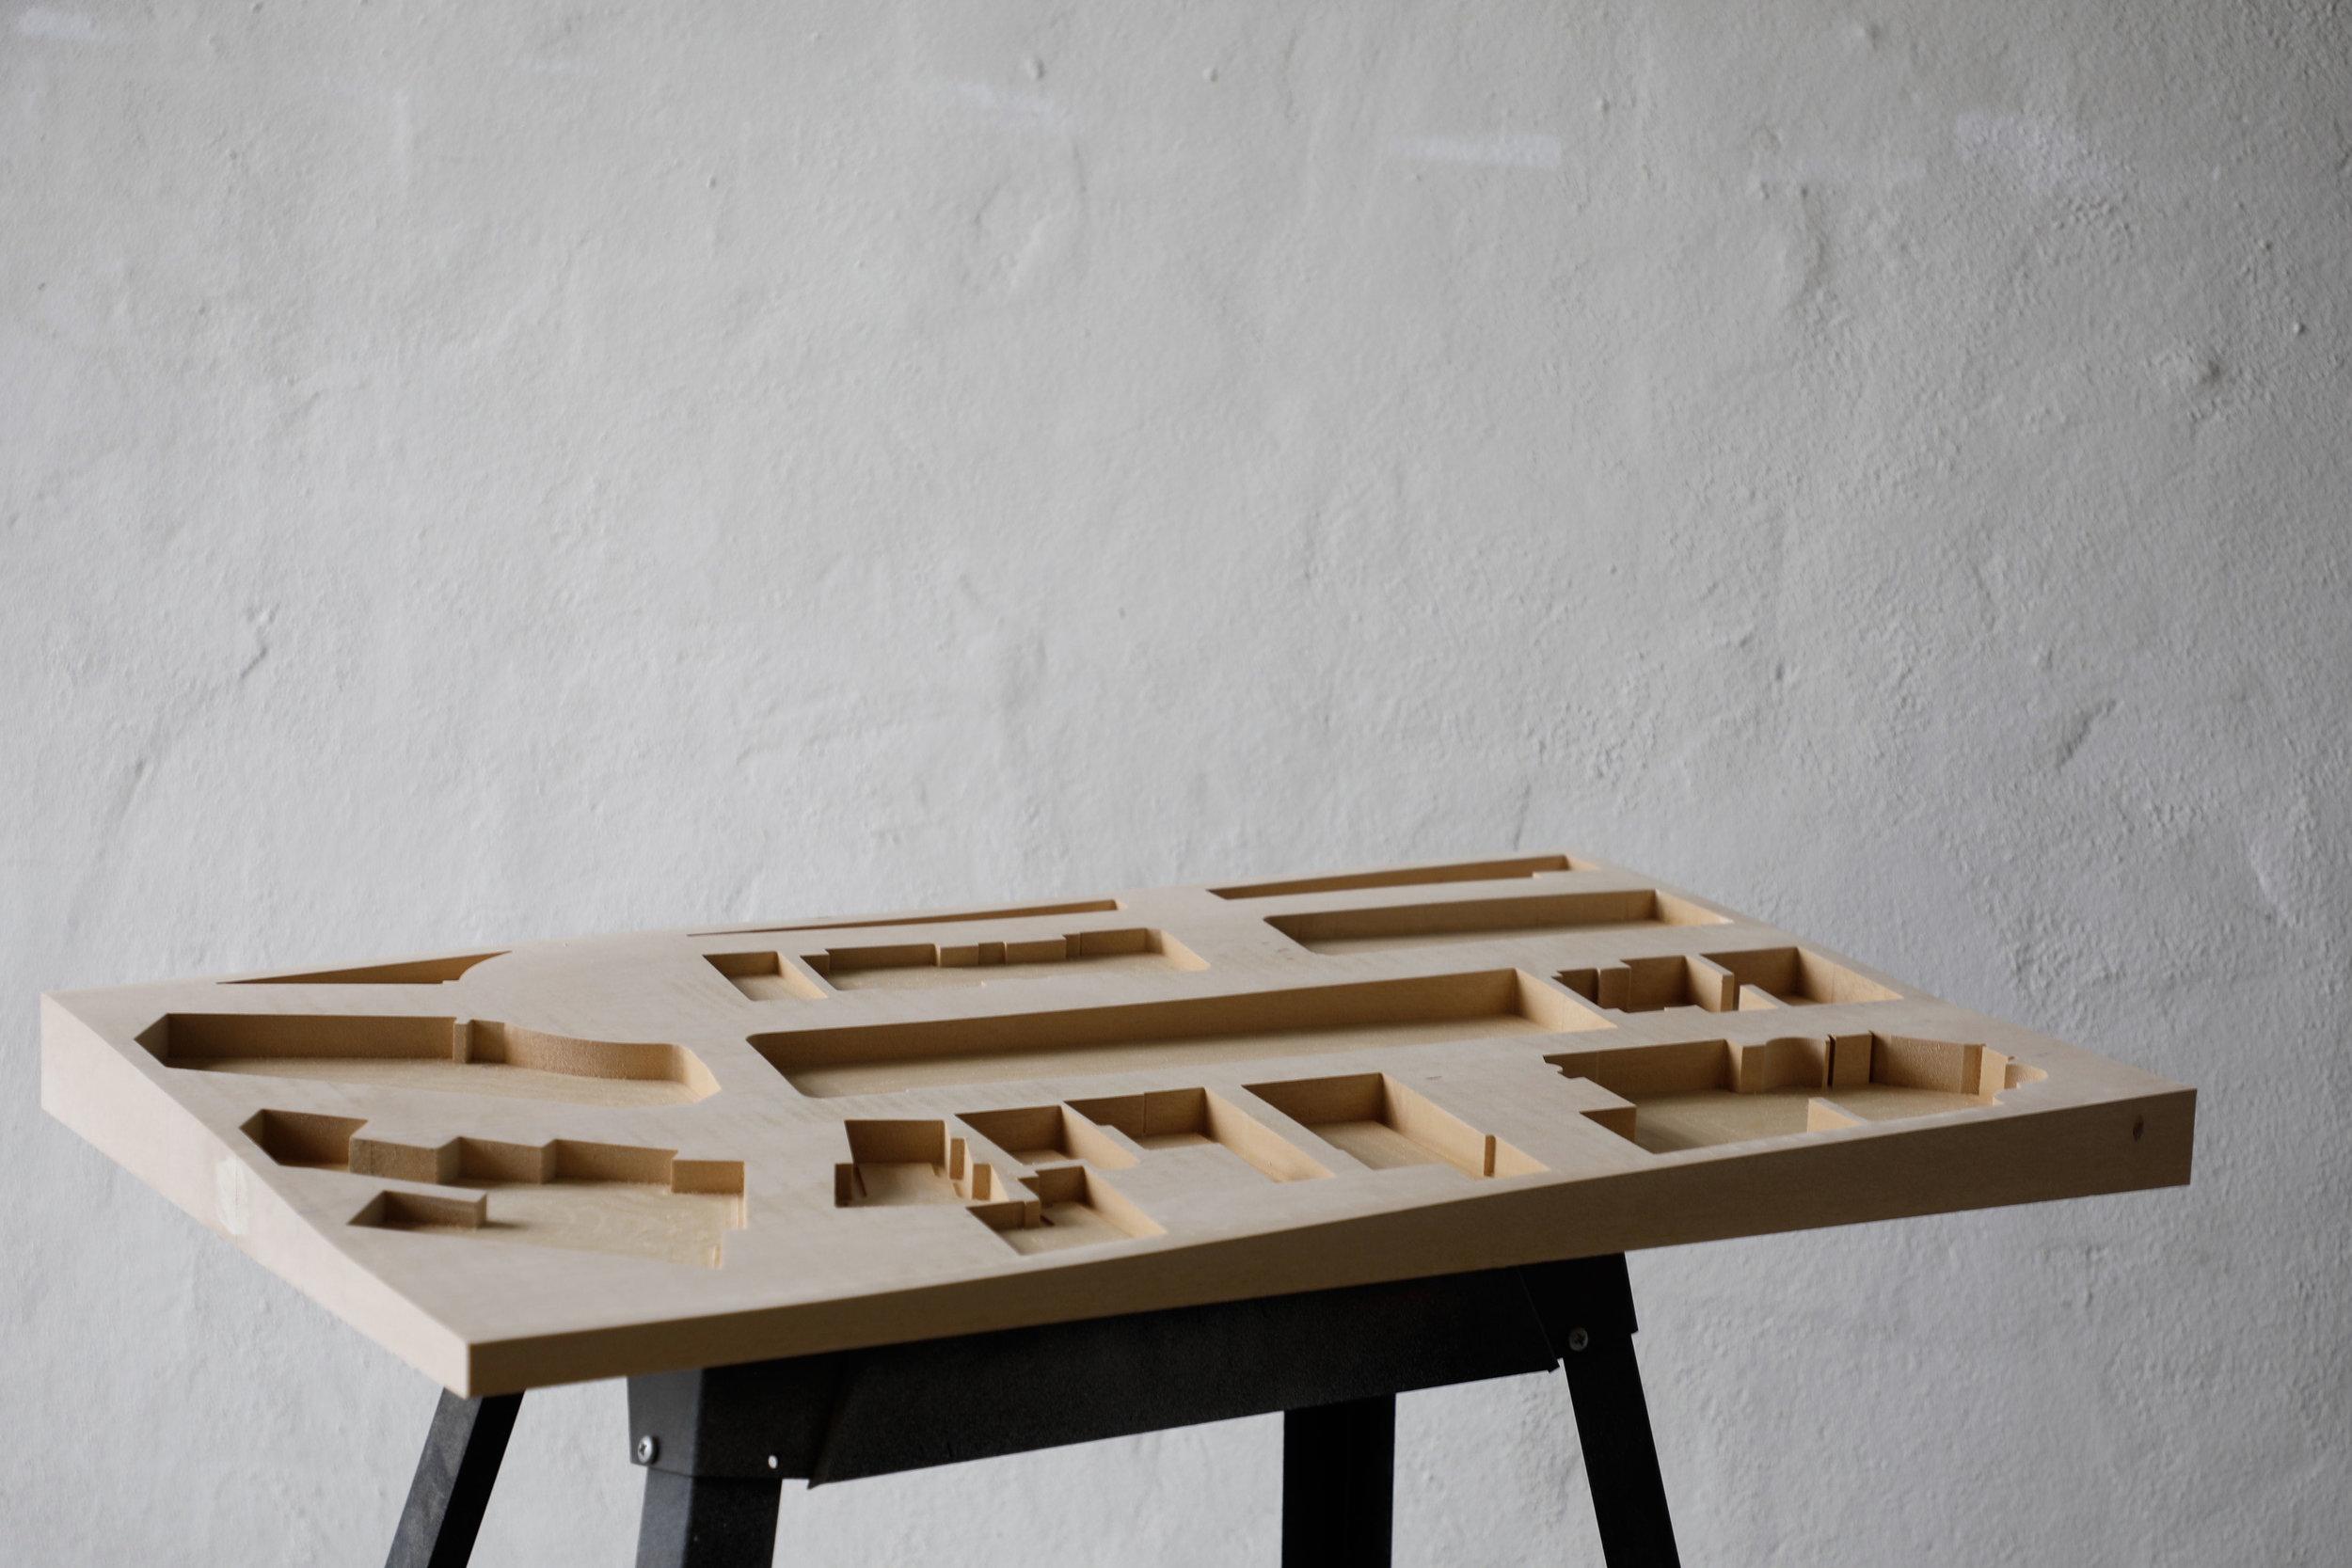 CNC_fabrication_sydney_timber_make_digital_3D.jpg